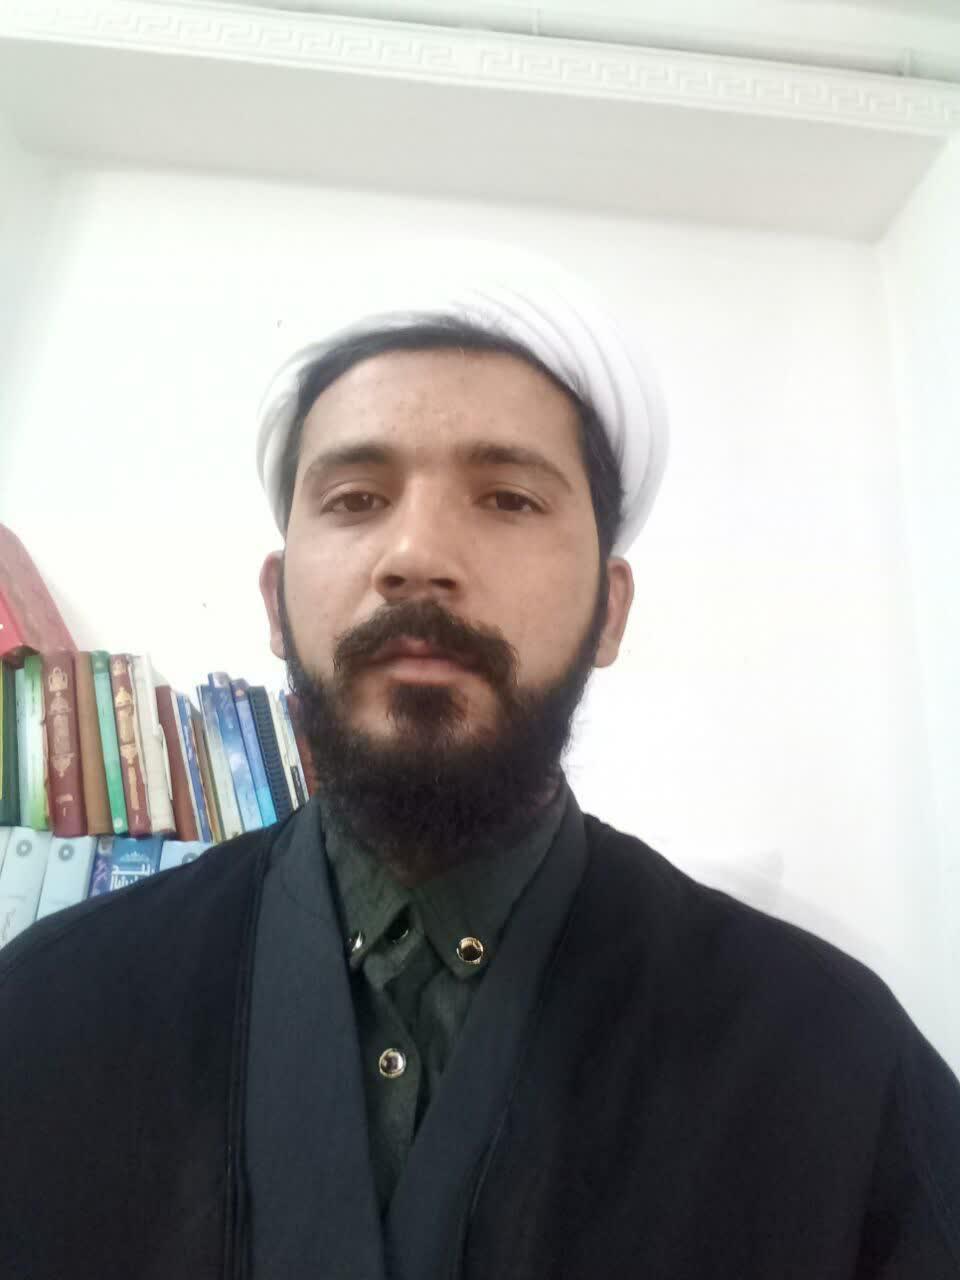 زندگینامه حجت الاسلام والمسلمین علی پریمی